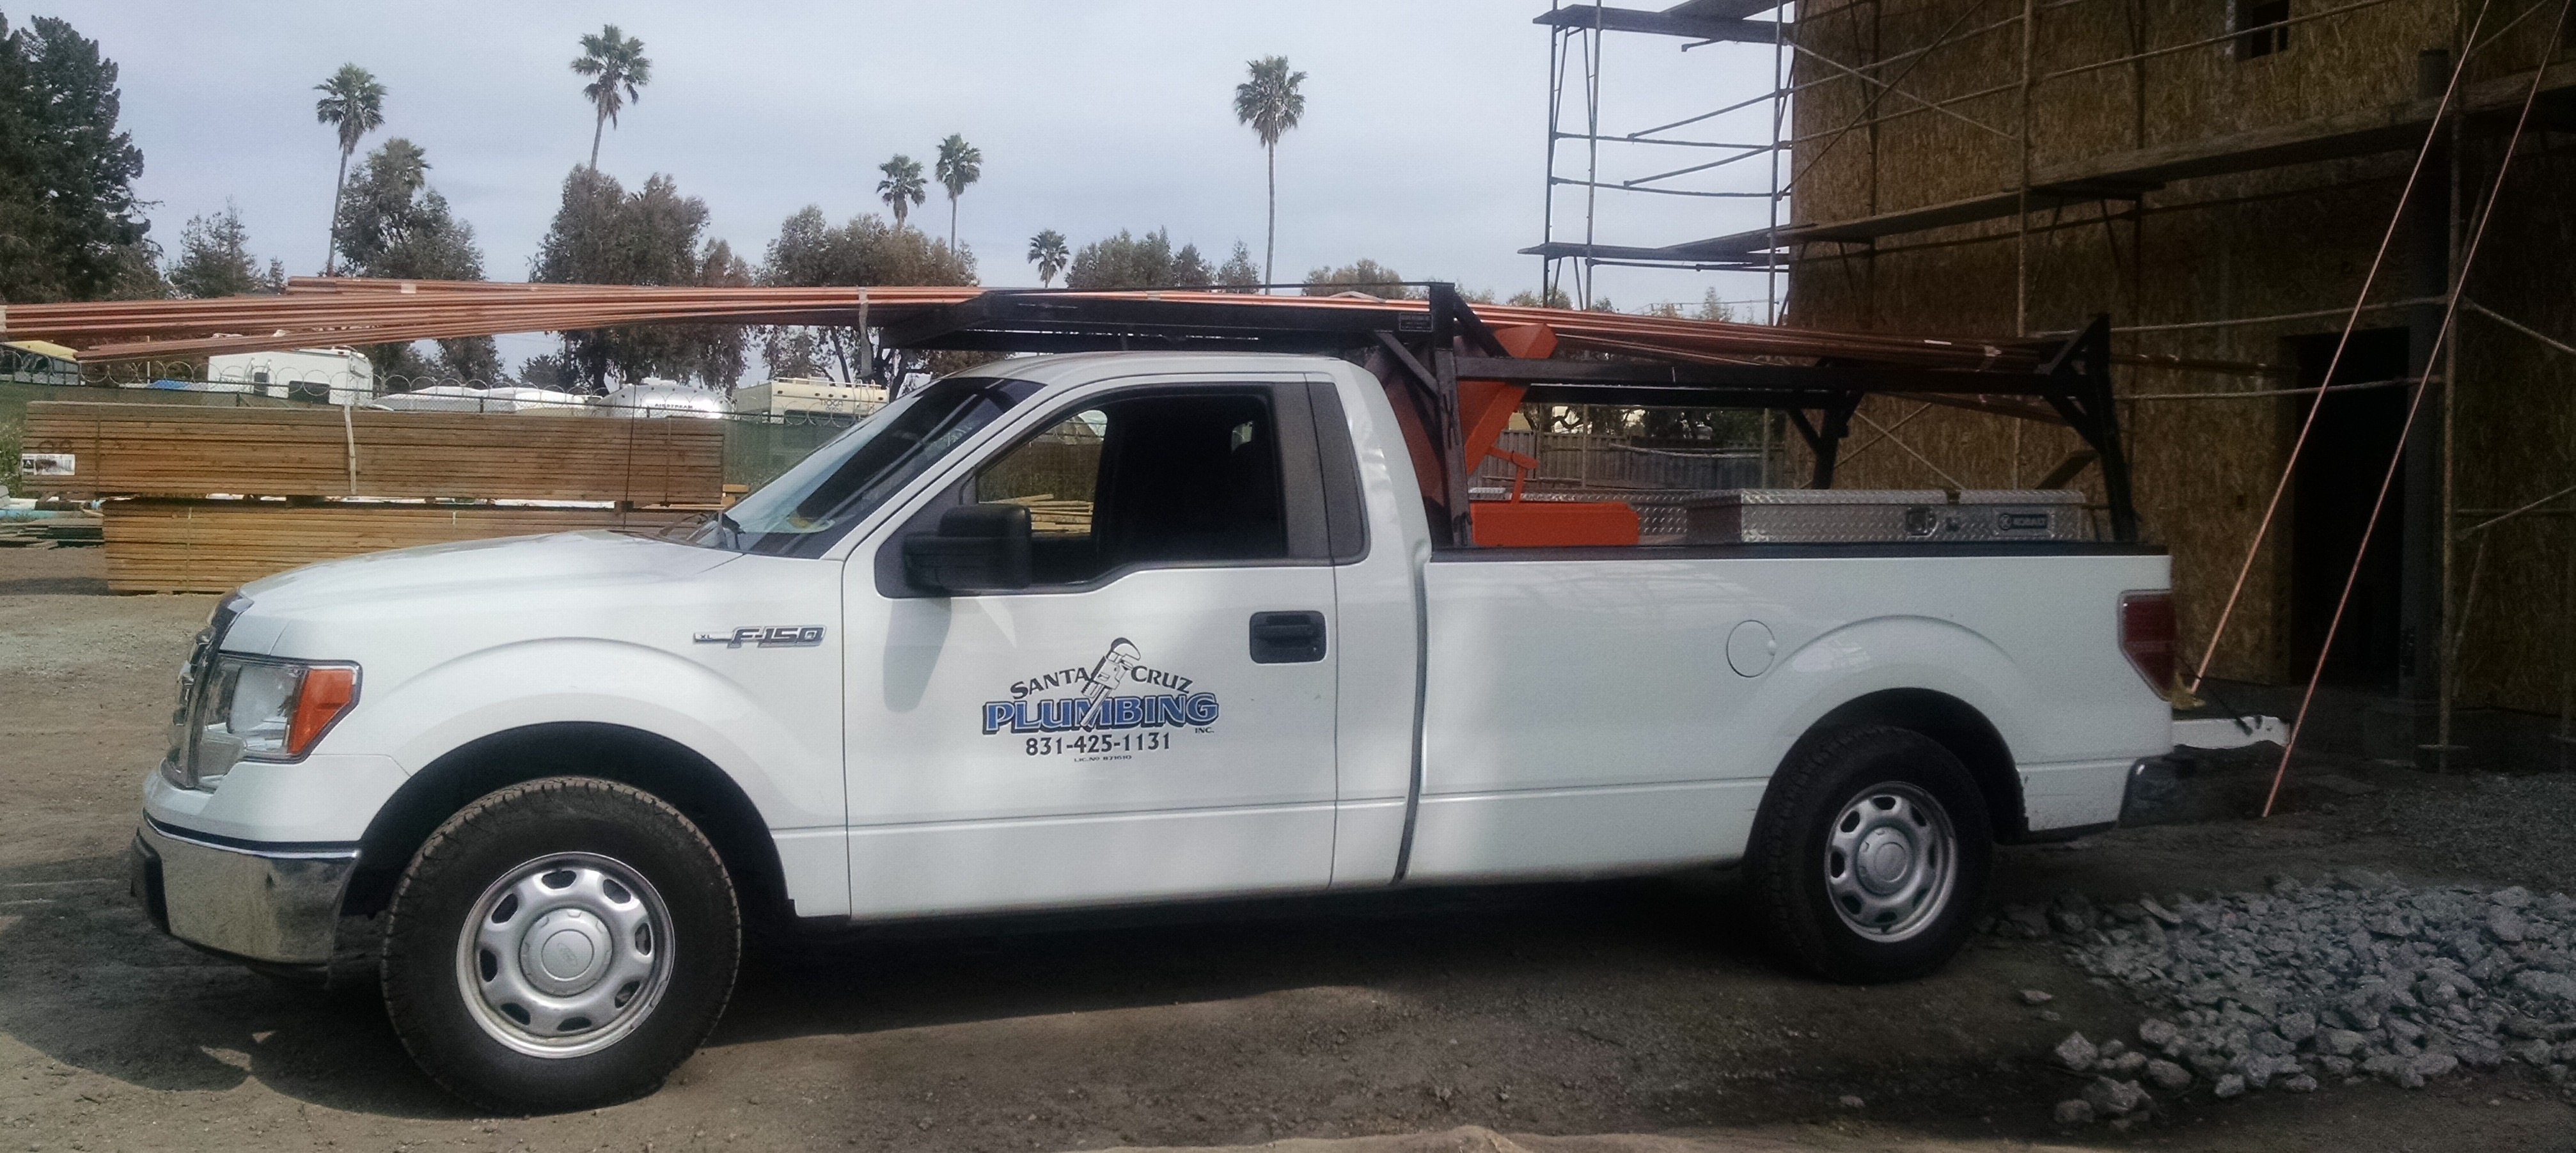 Santa Cruz Plumbing Inc.